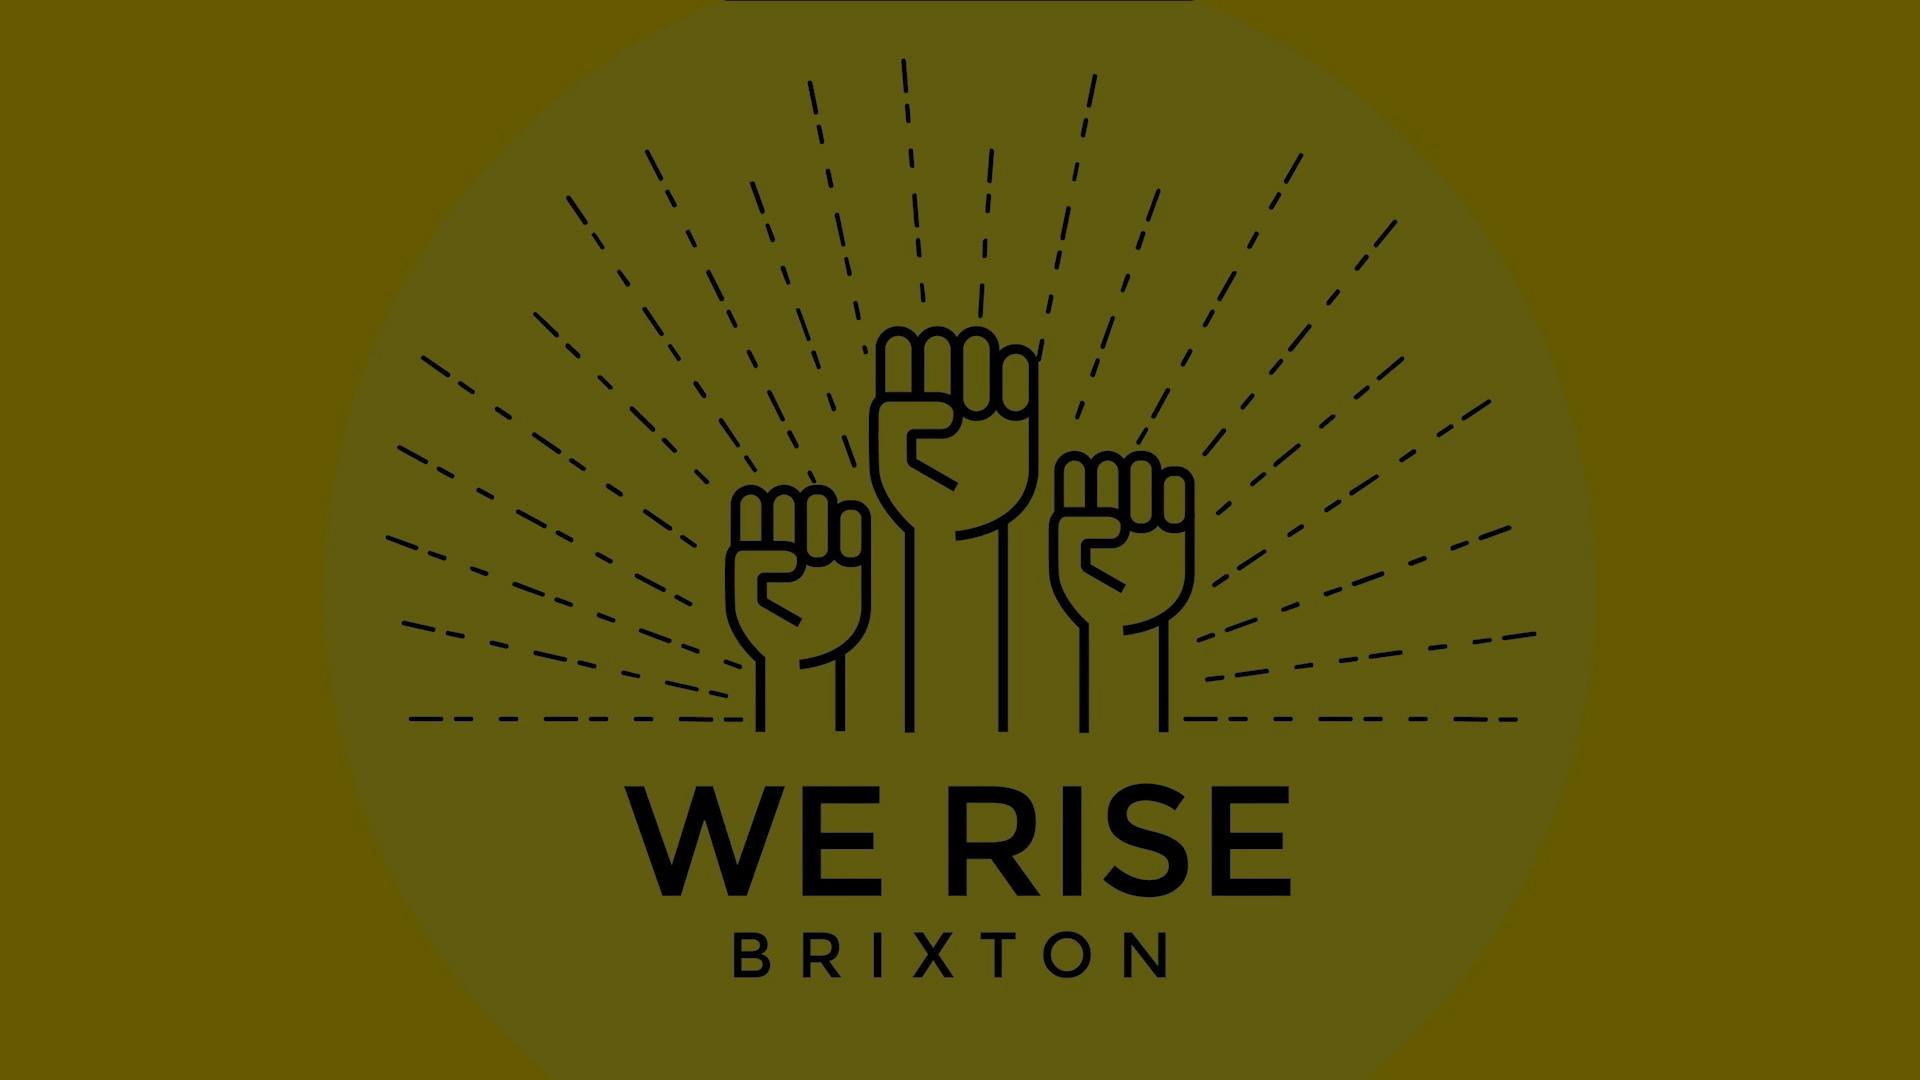 We Rise Brixton logo